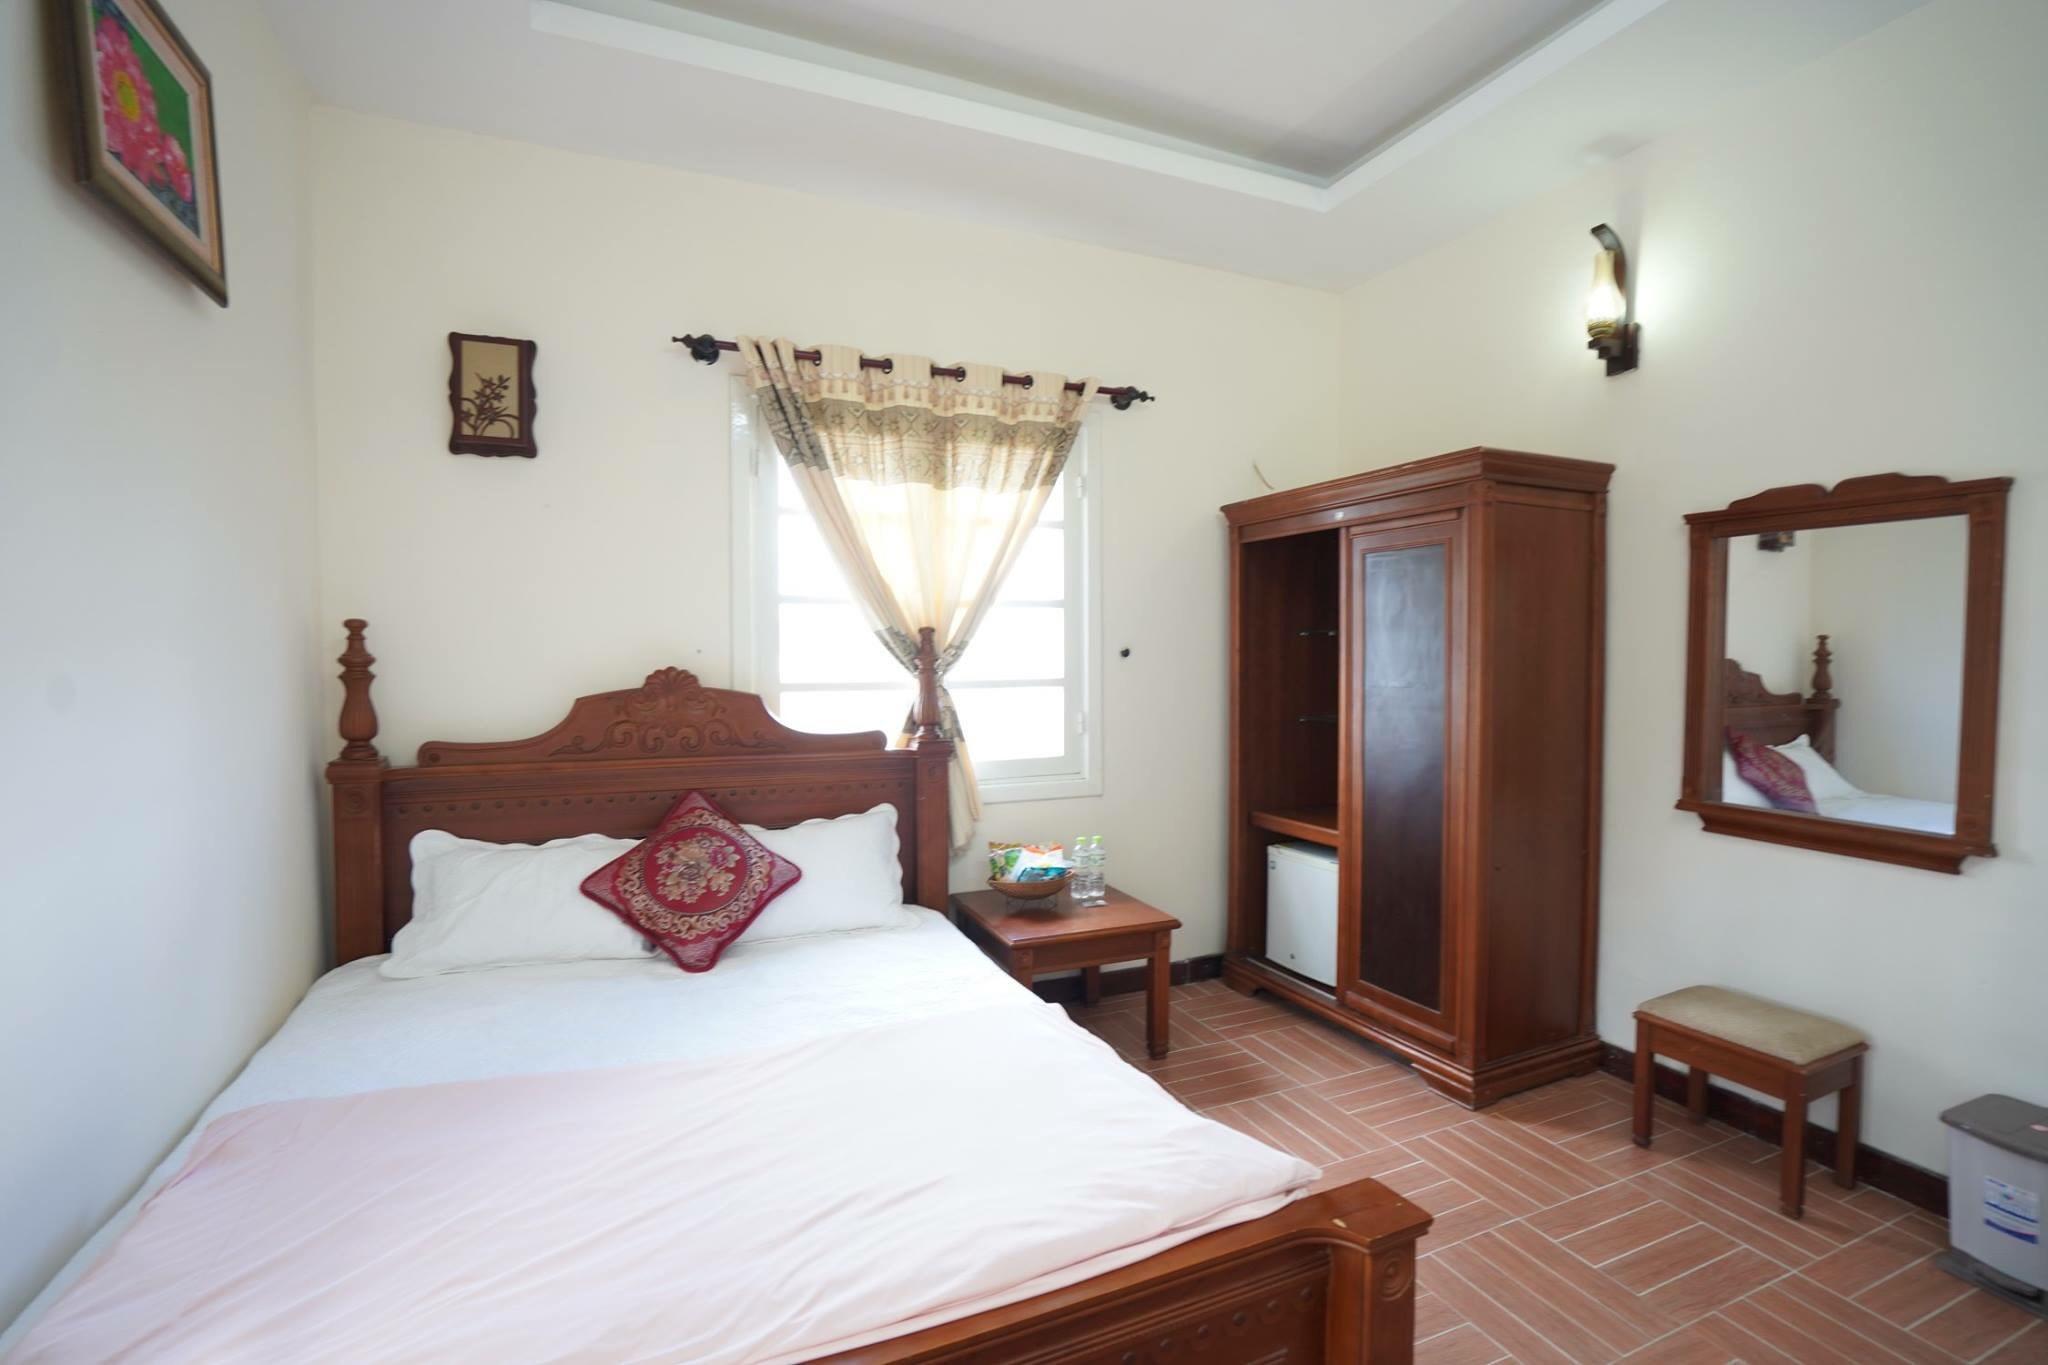 Biet Thu Phap Emilie Room 201